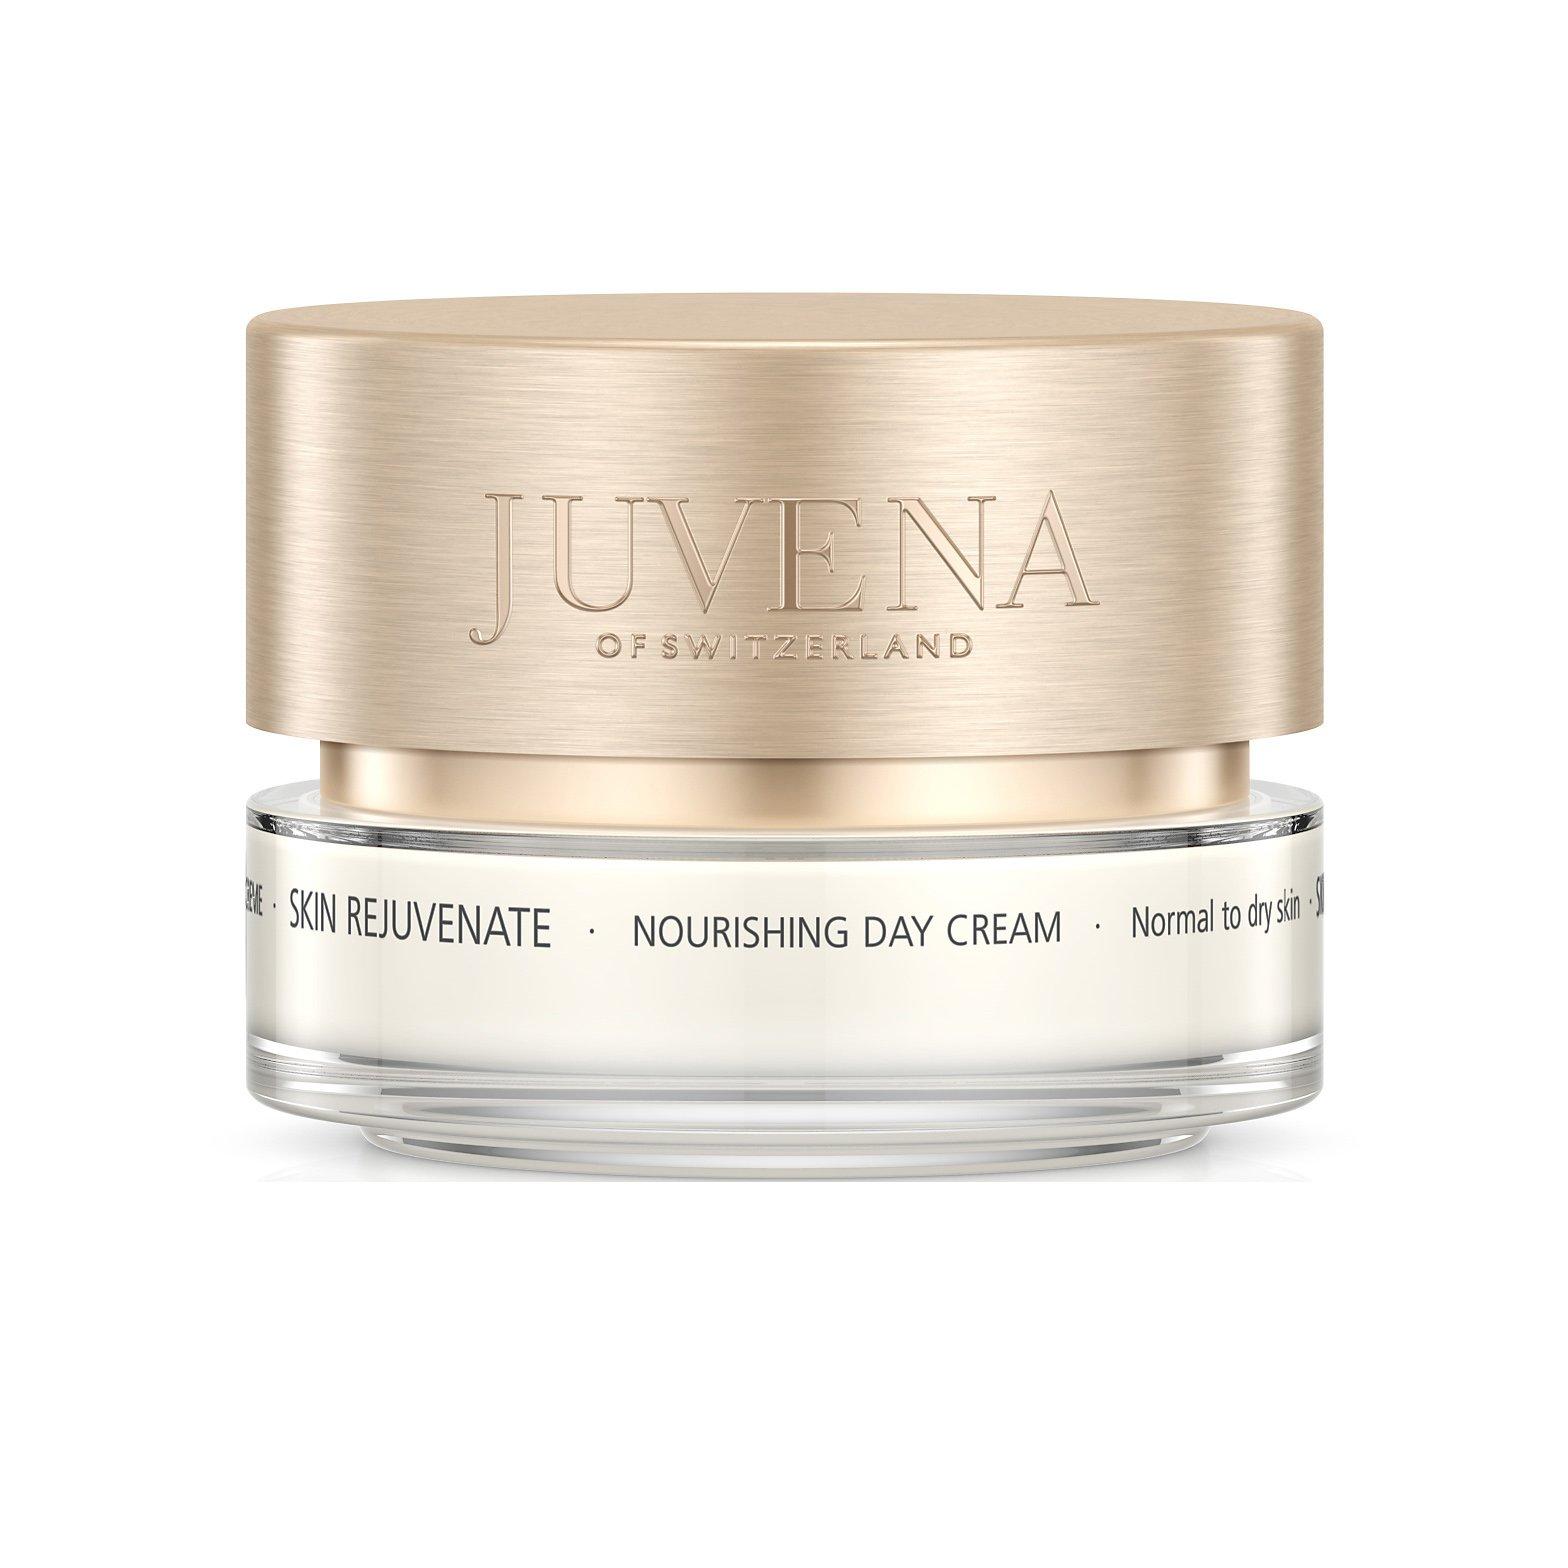 Juvena Skin Rejuvenate Nourishing Eye Cream Εντατική Θρεπτική Αντιρυτιδική Κρέμα Ματιών 15ml